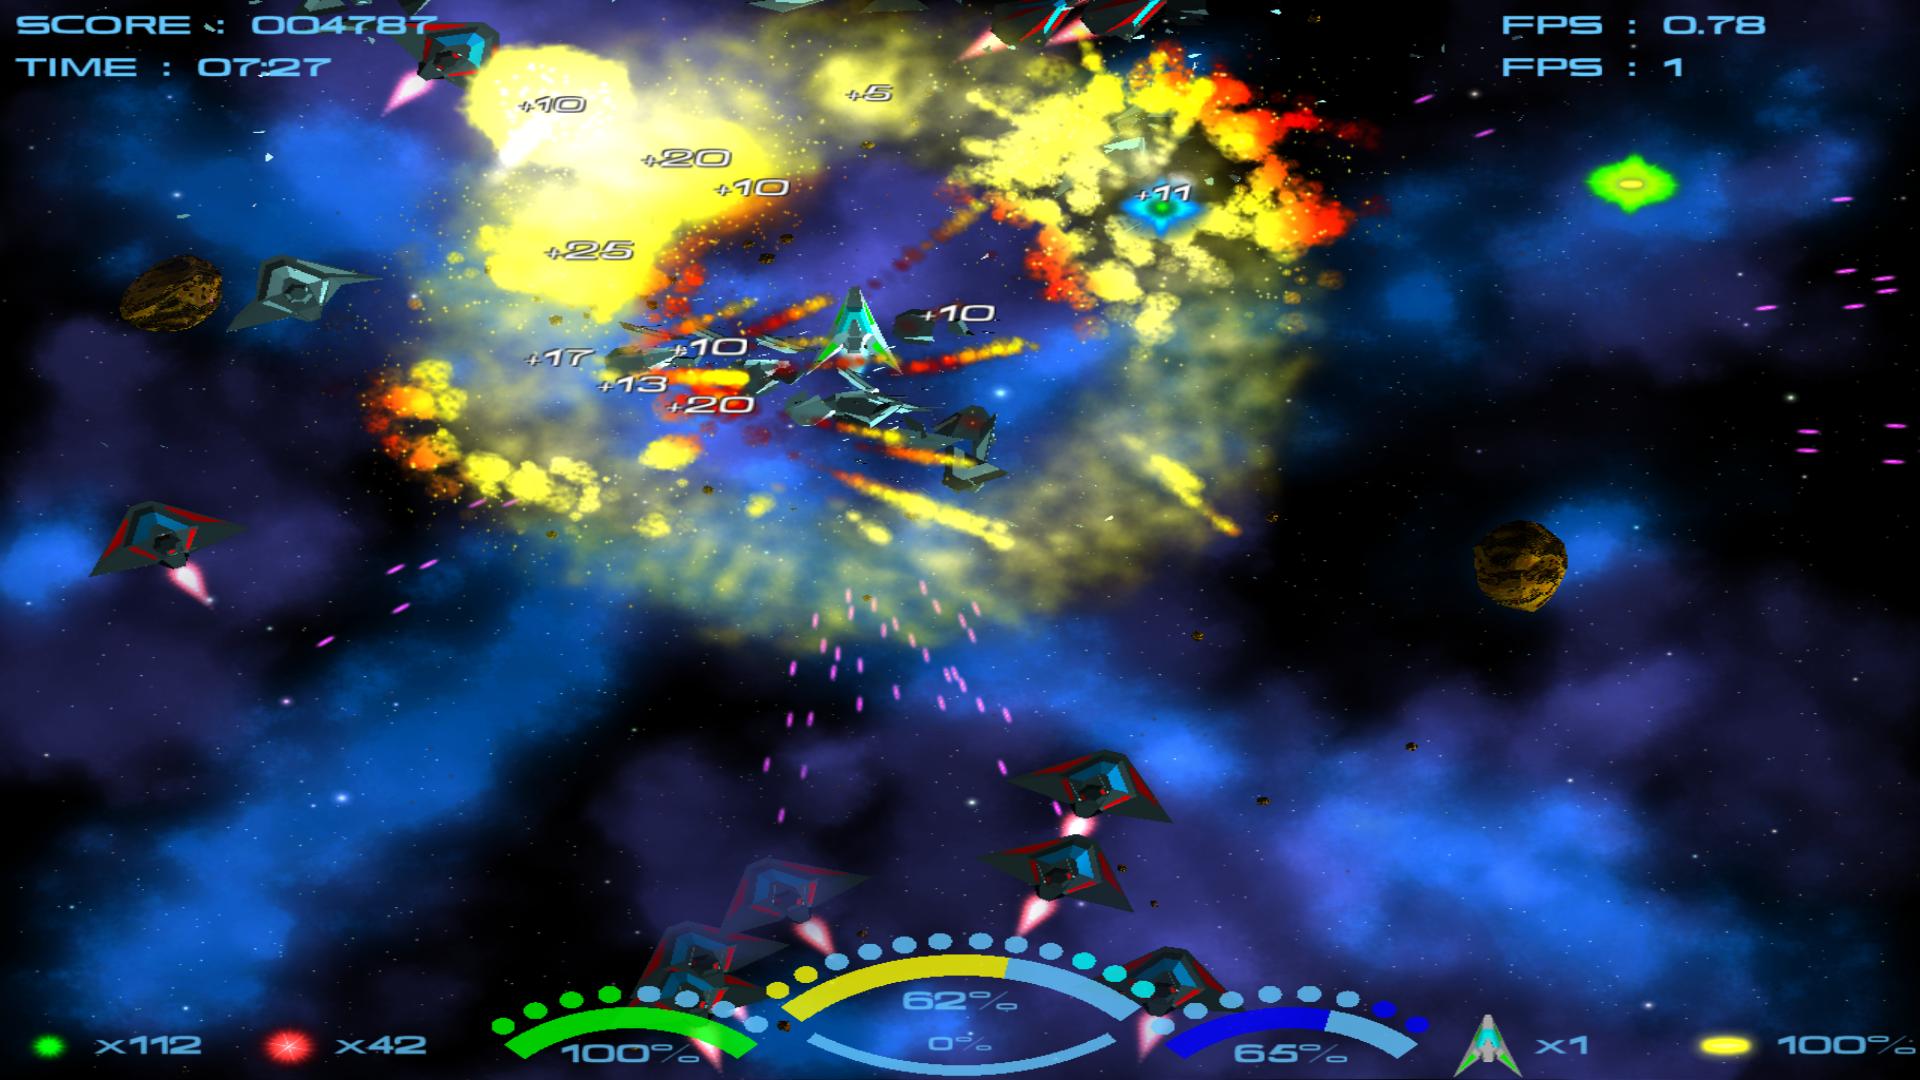 screenshot deflectBlaster2